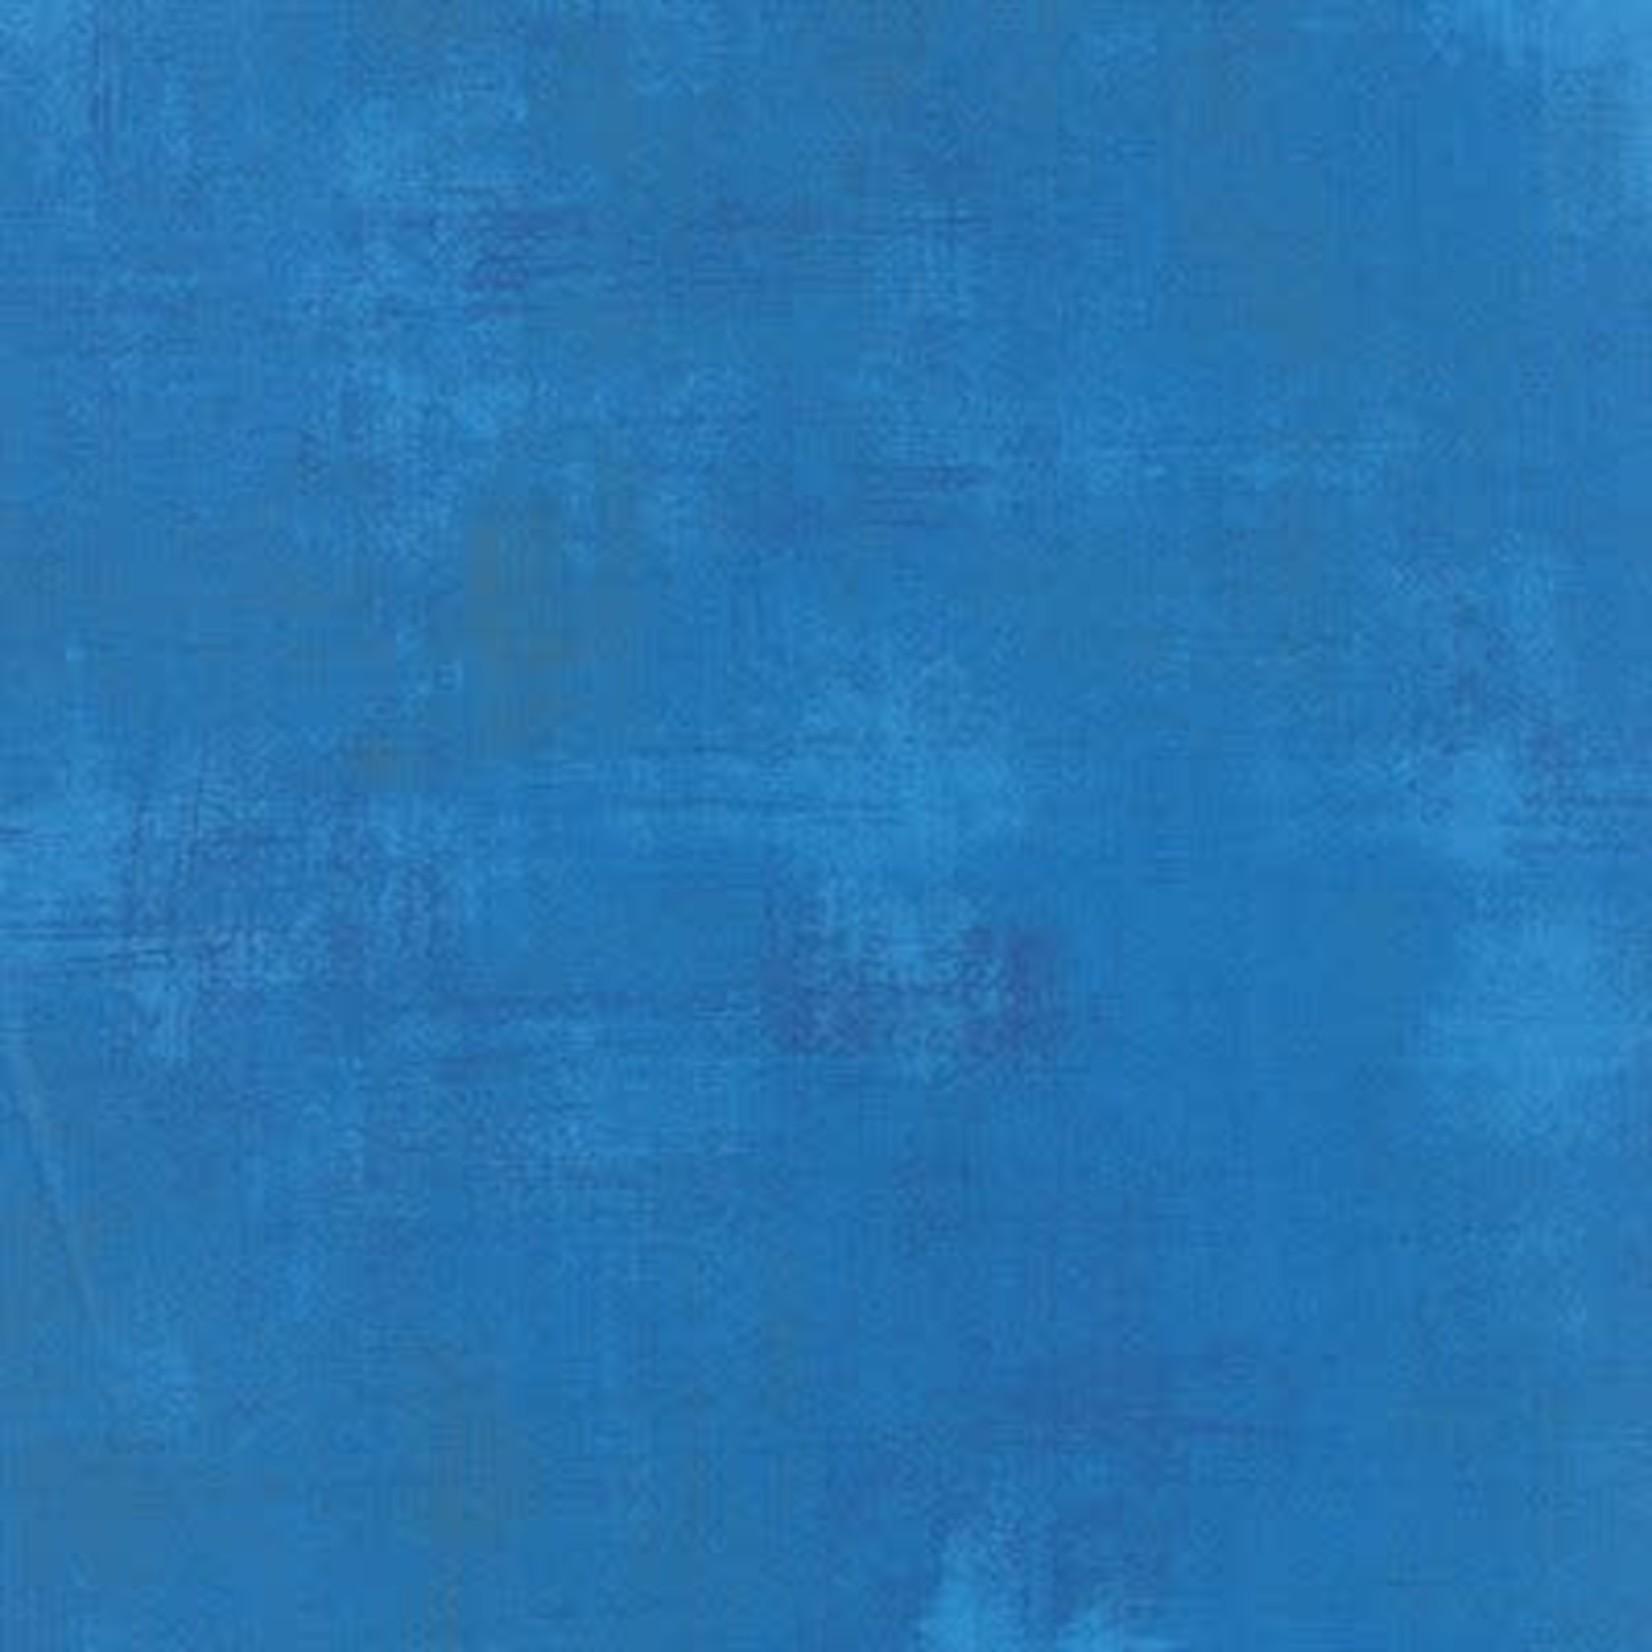 Moda Grunge Basics Grunge - Bright Sky per cm or $20/m